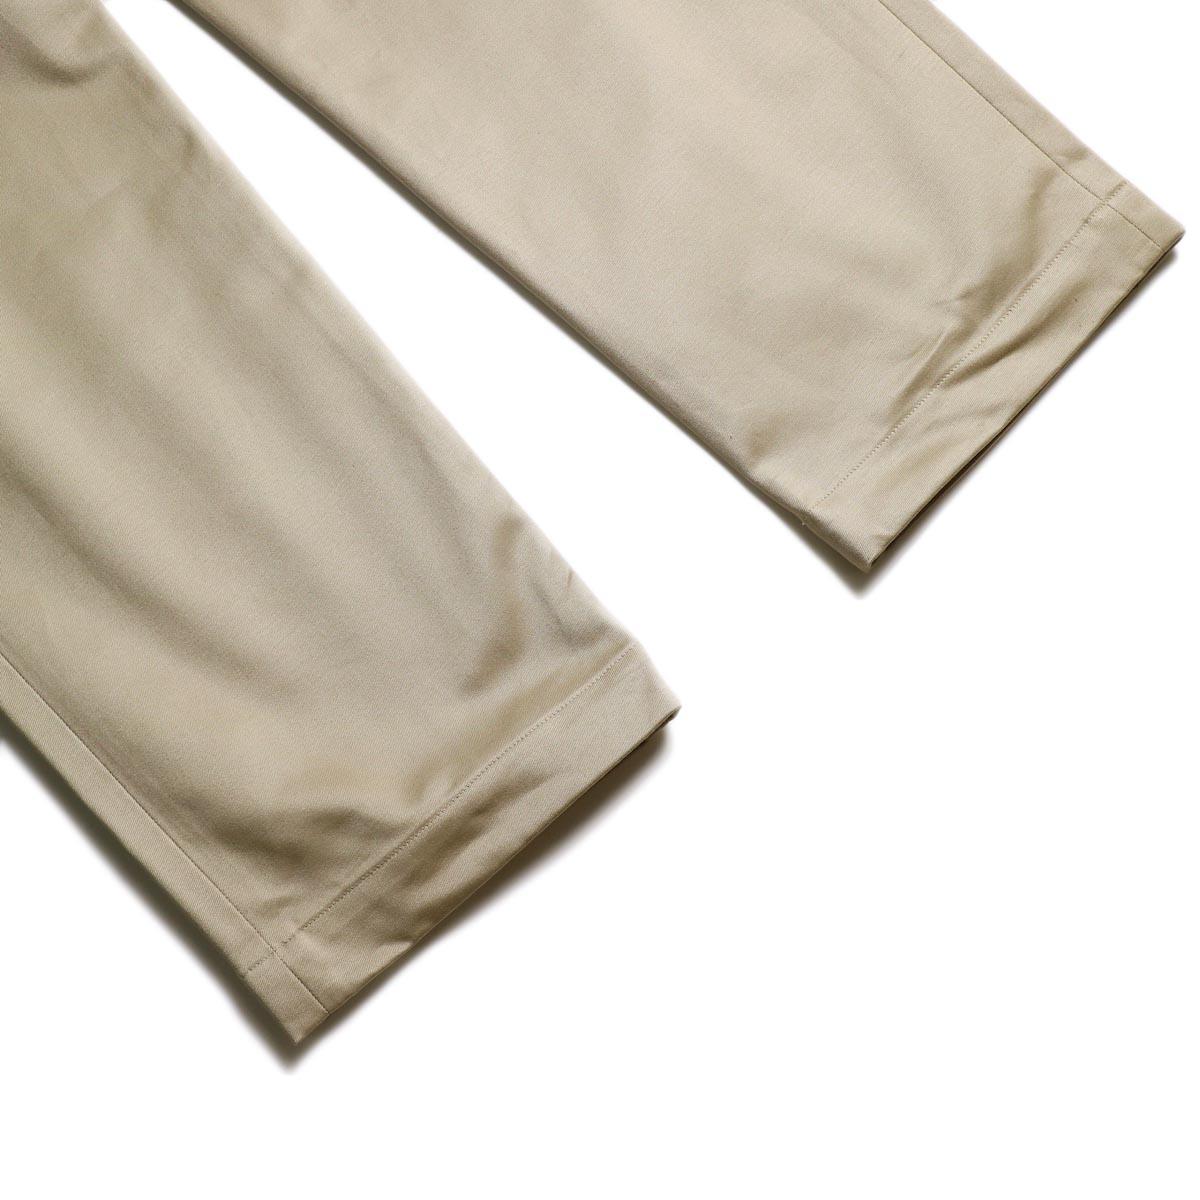 FUTURE PRIMITIVE / FP FZ CHINO PANTS (Beige)裾